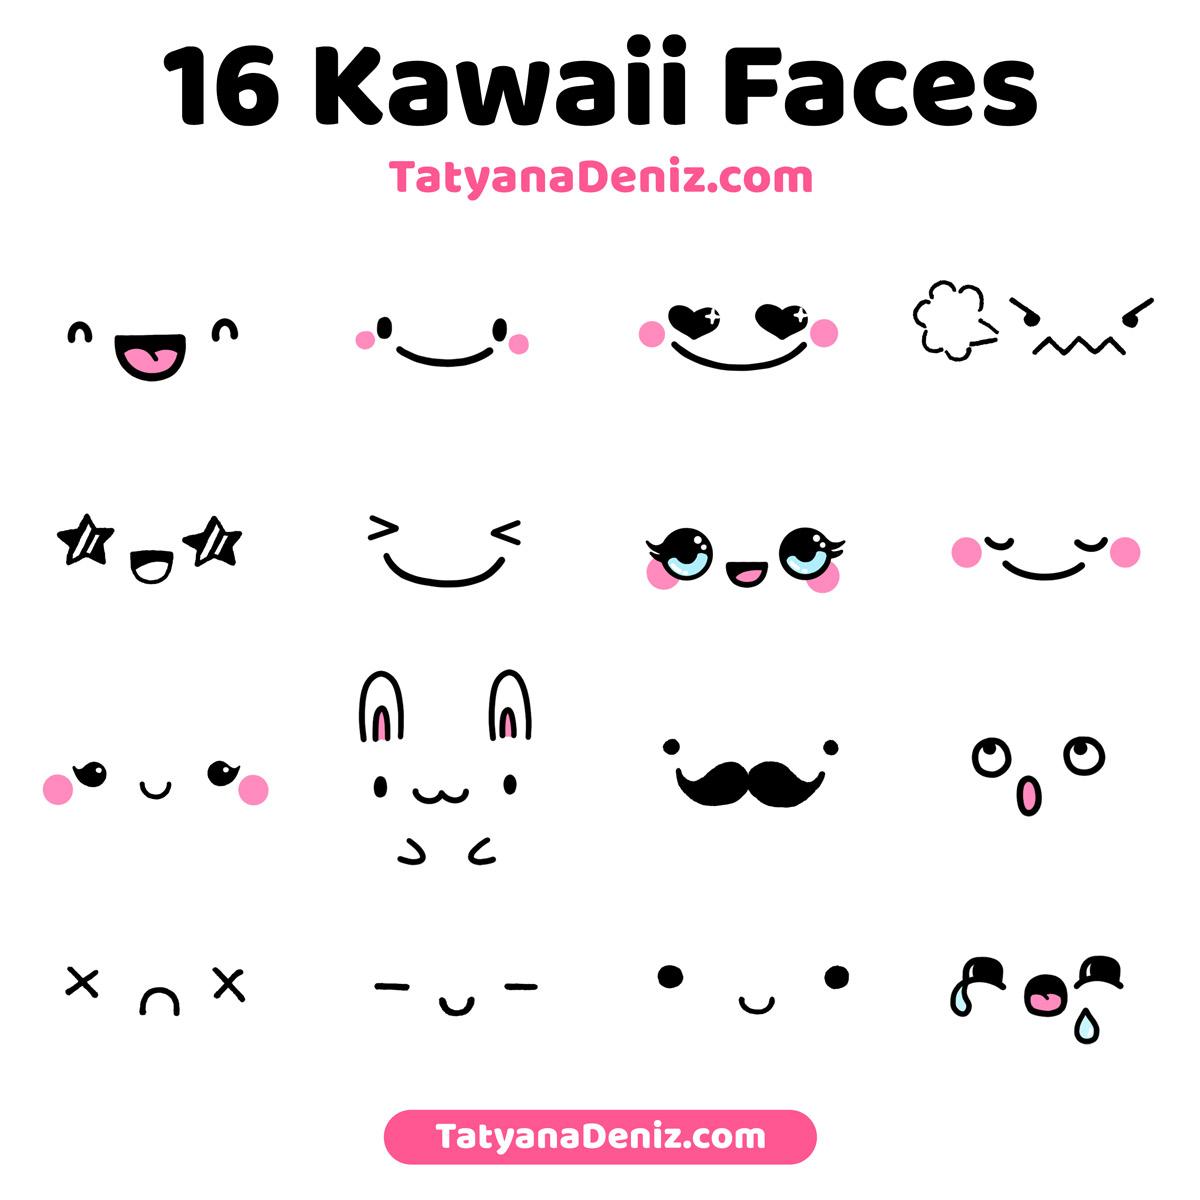 Kawaii faces and expressions